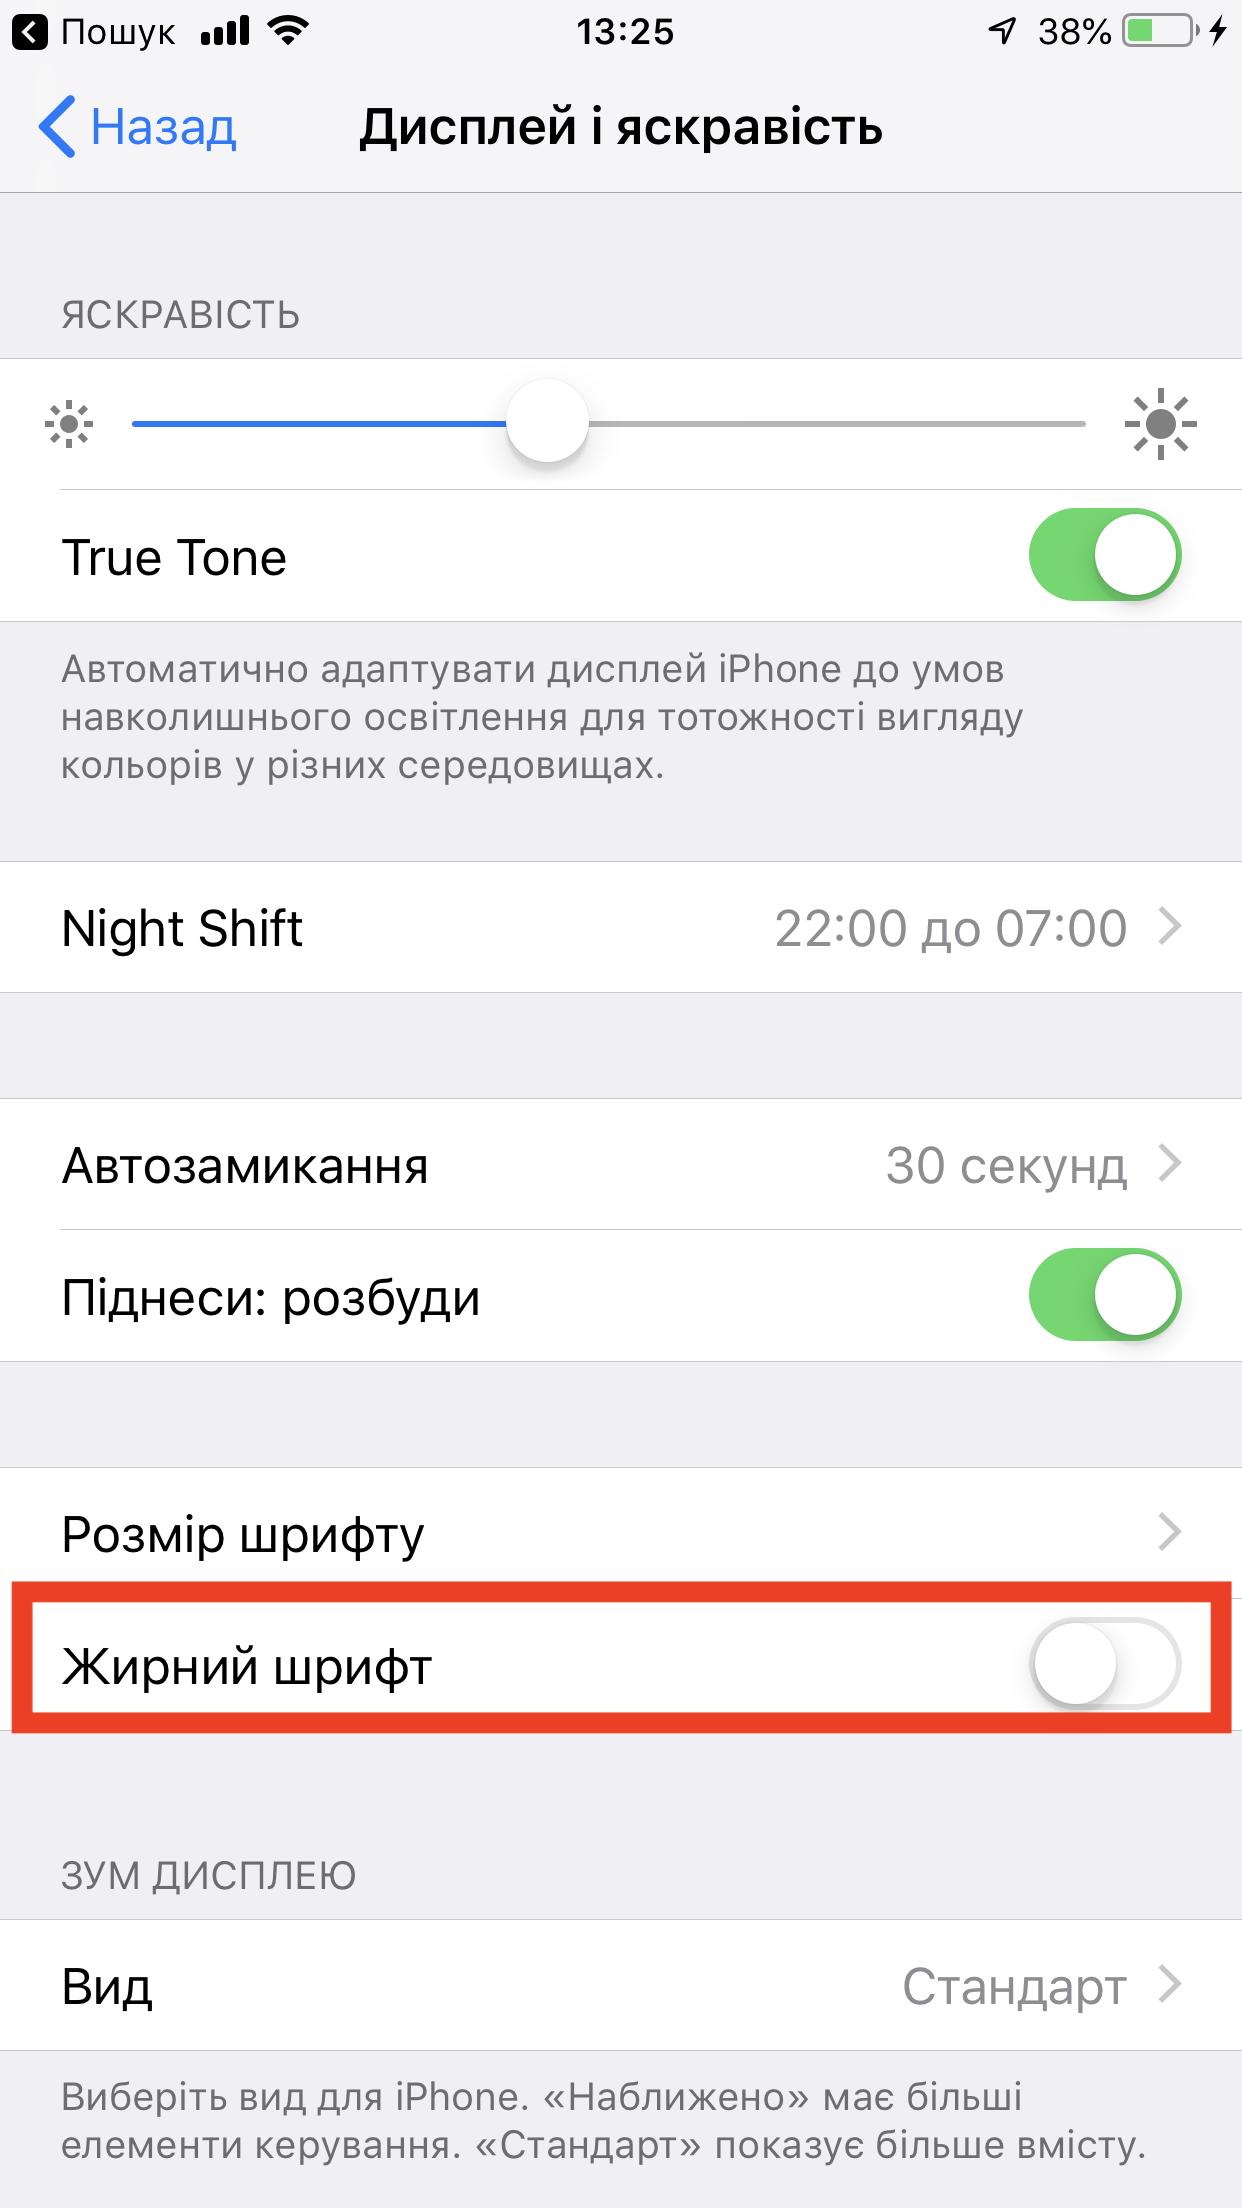 iPhone жирний шрифт